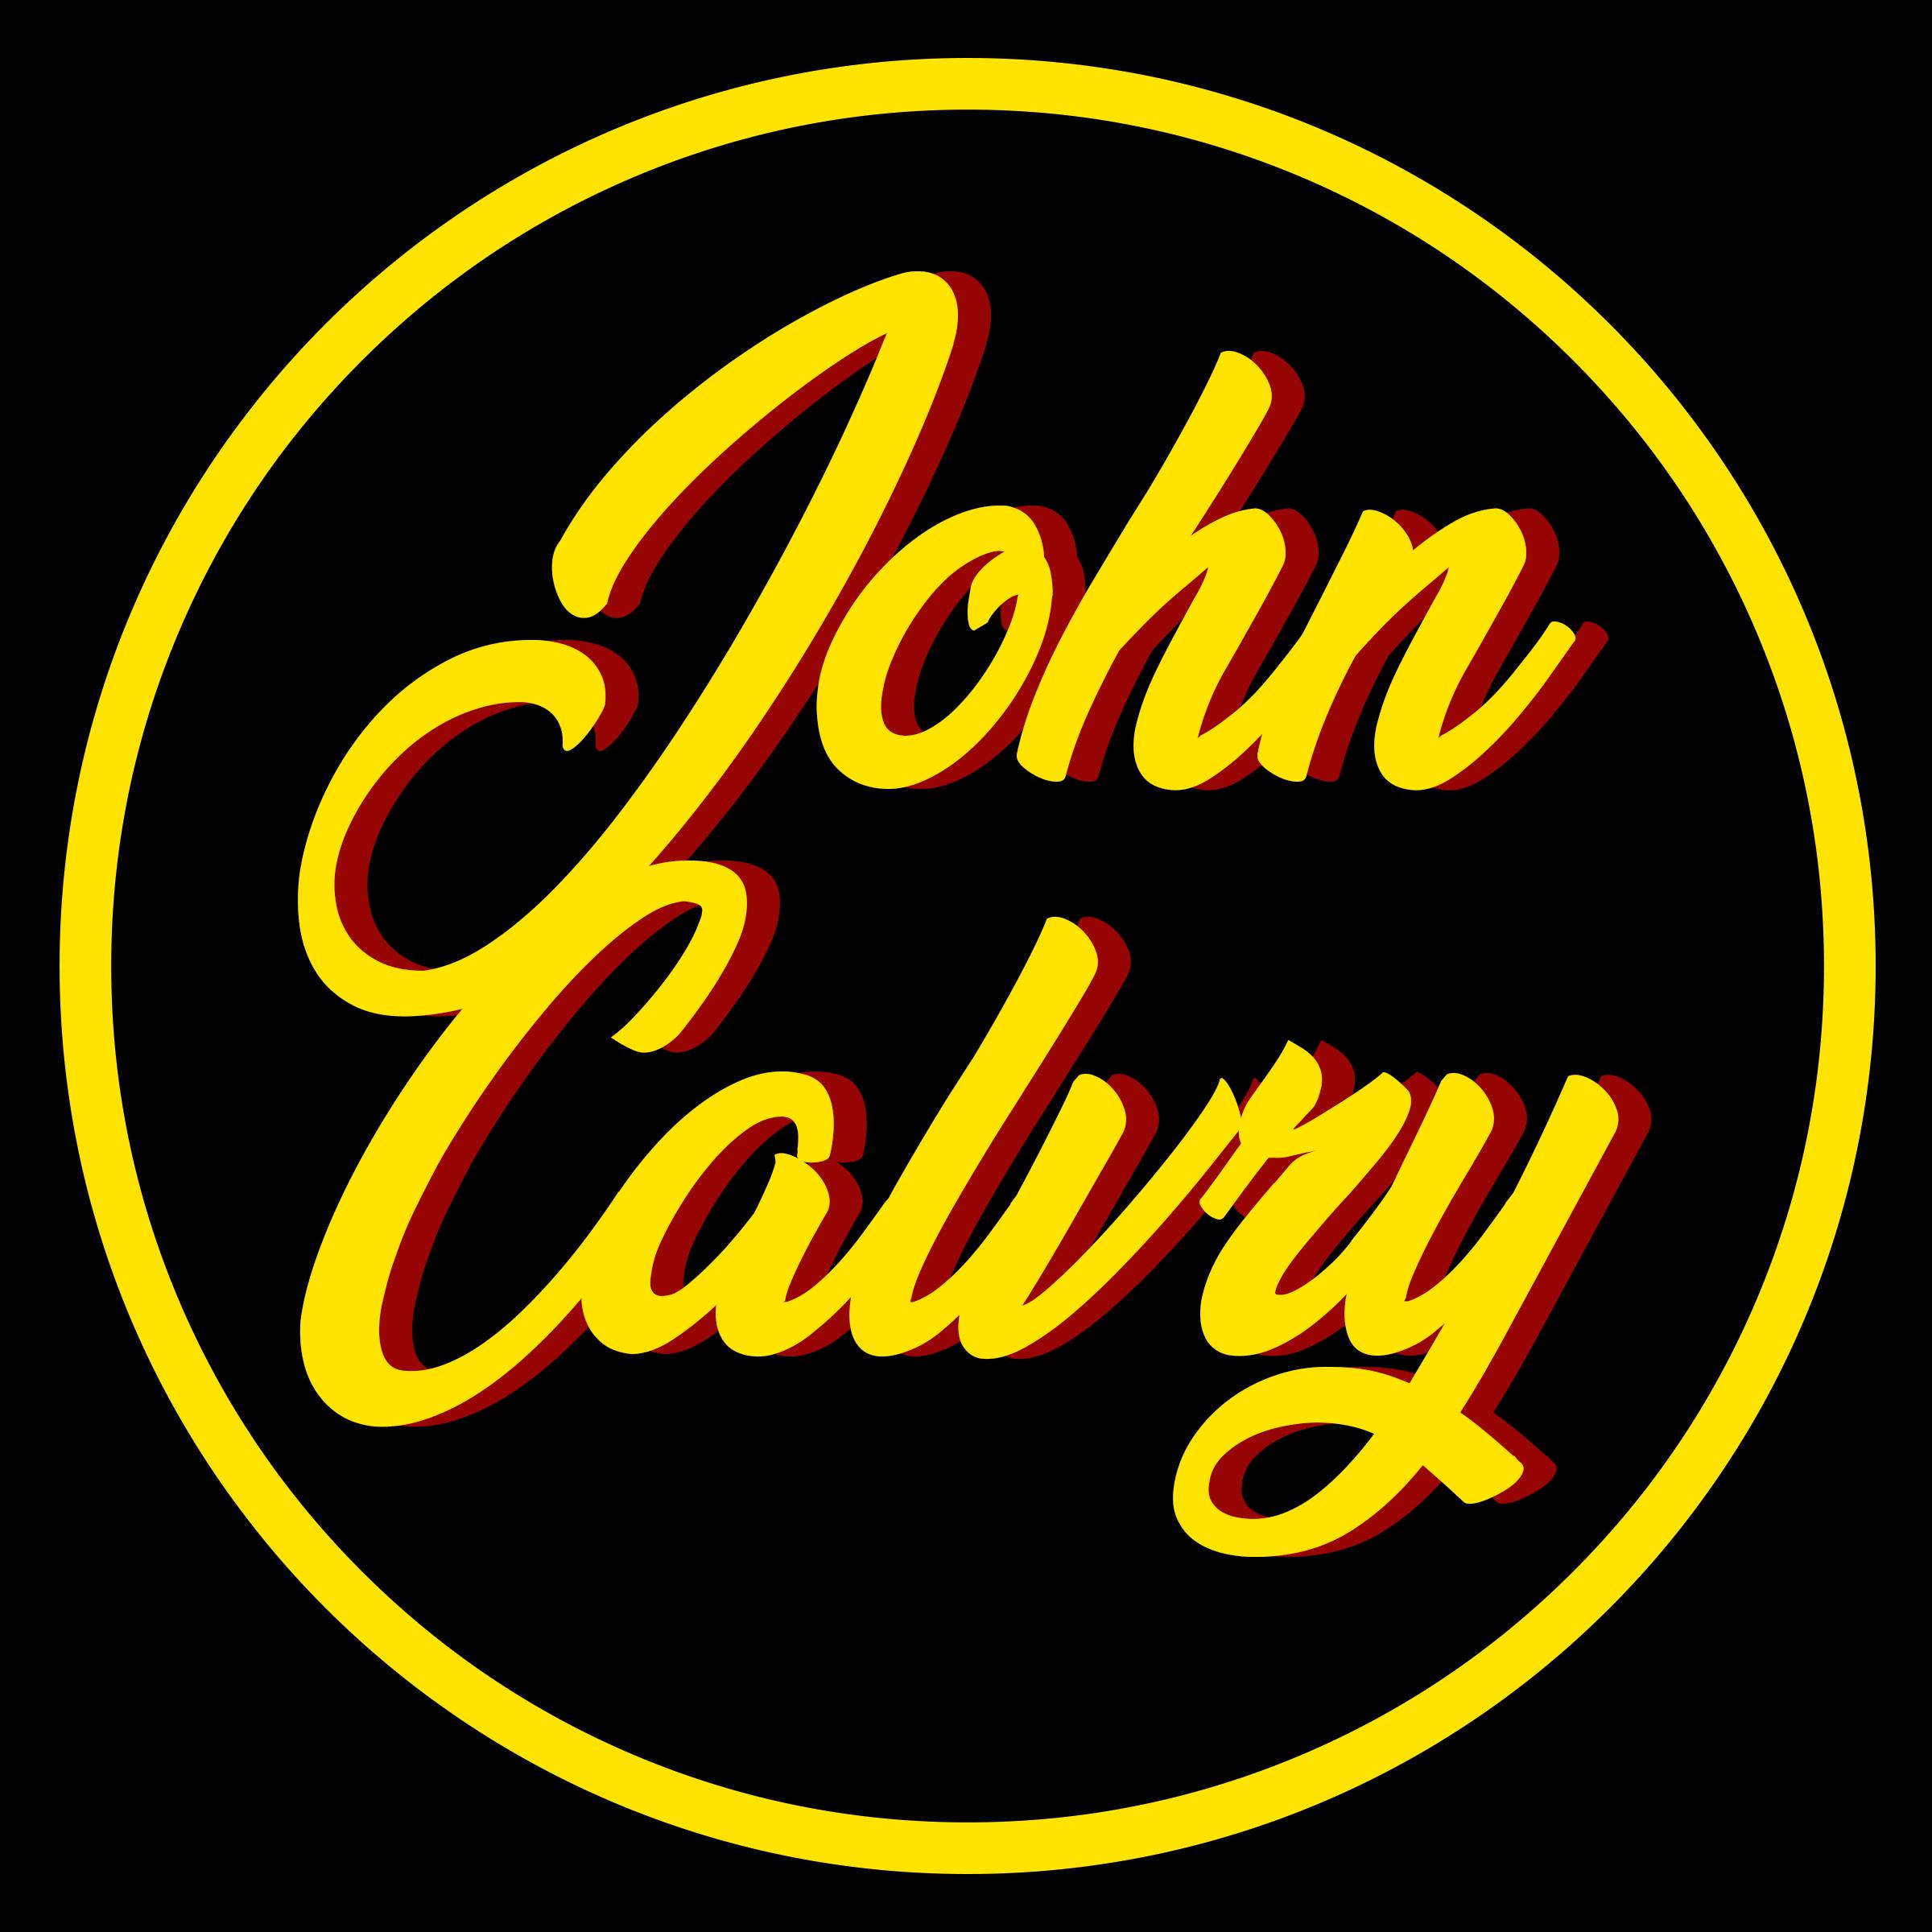 JohnCalvryLOGOFINAL.jpg